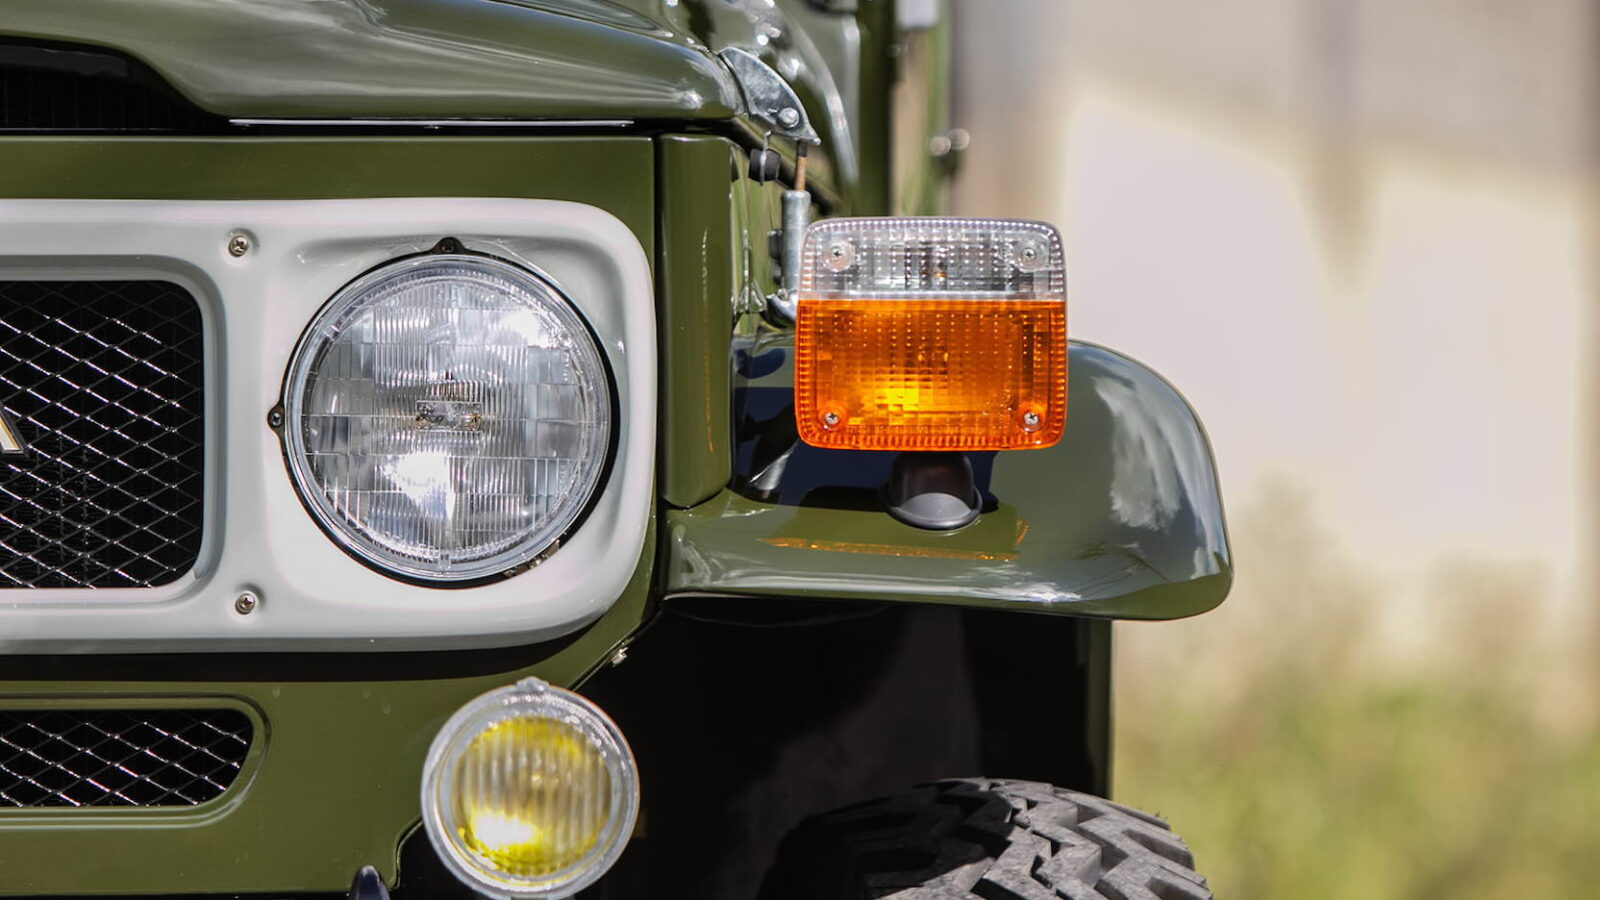 Toyota FJ-45 Land Cruiser Pickup Headlight